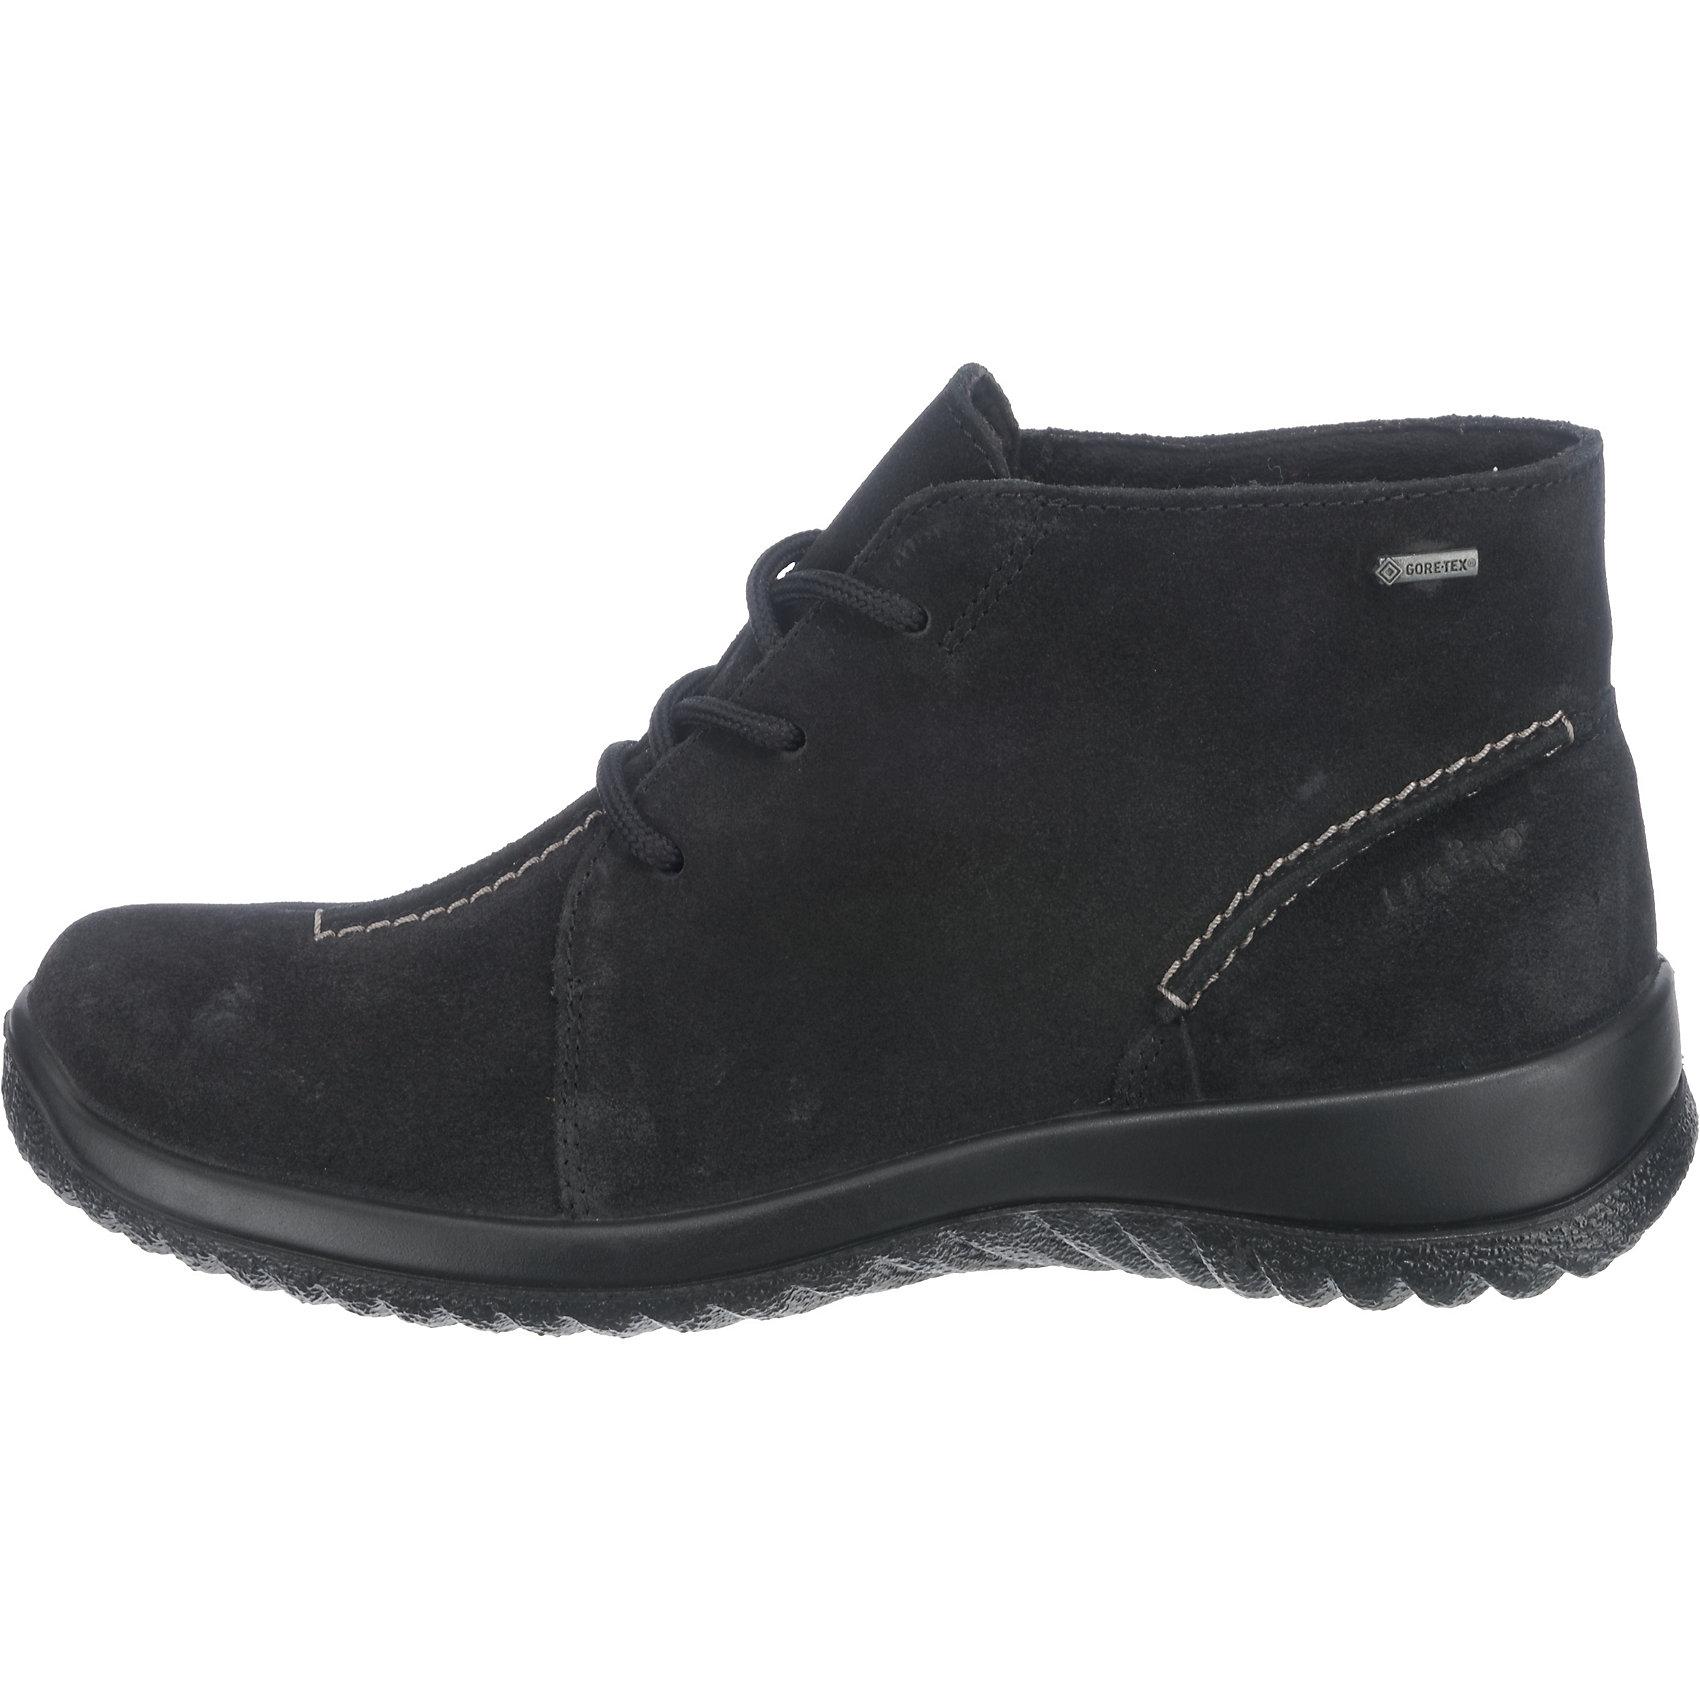 41fe0cfaf36c ... Nike Zoom KD 9 Air Black Anthracite 843392-001 Men s Men s Men s  Basketball Shoes ...